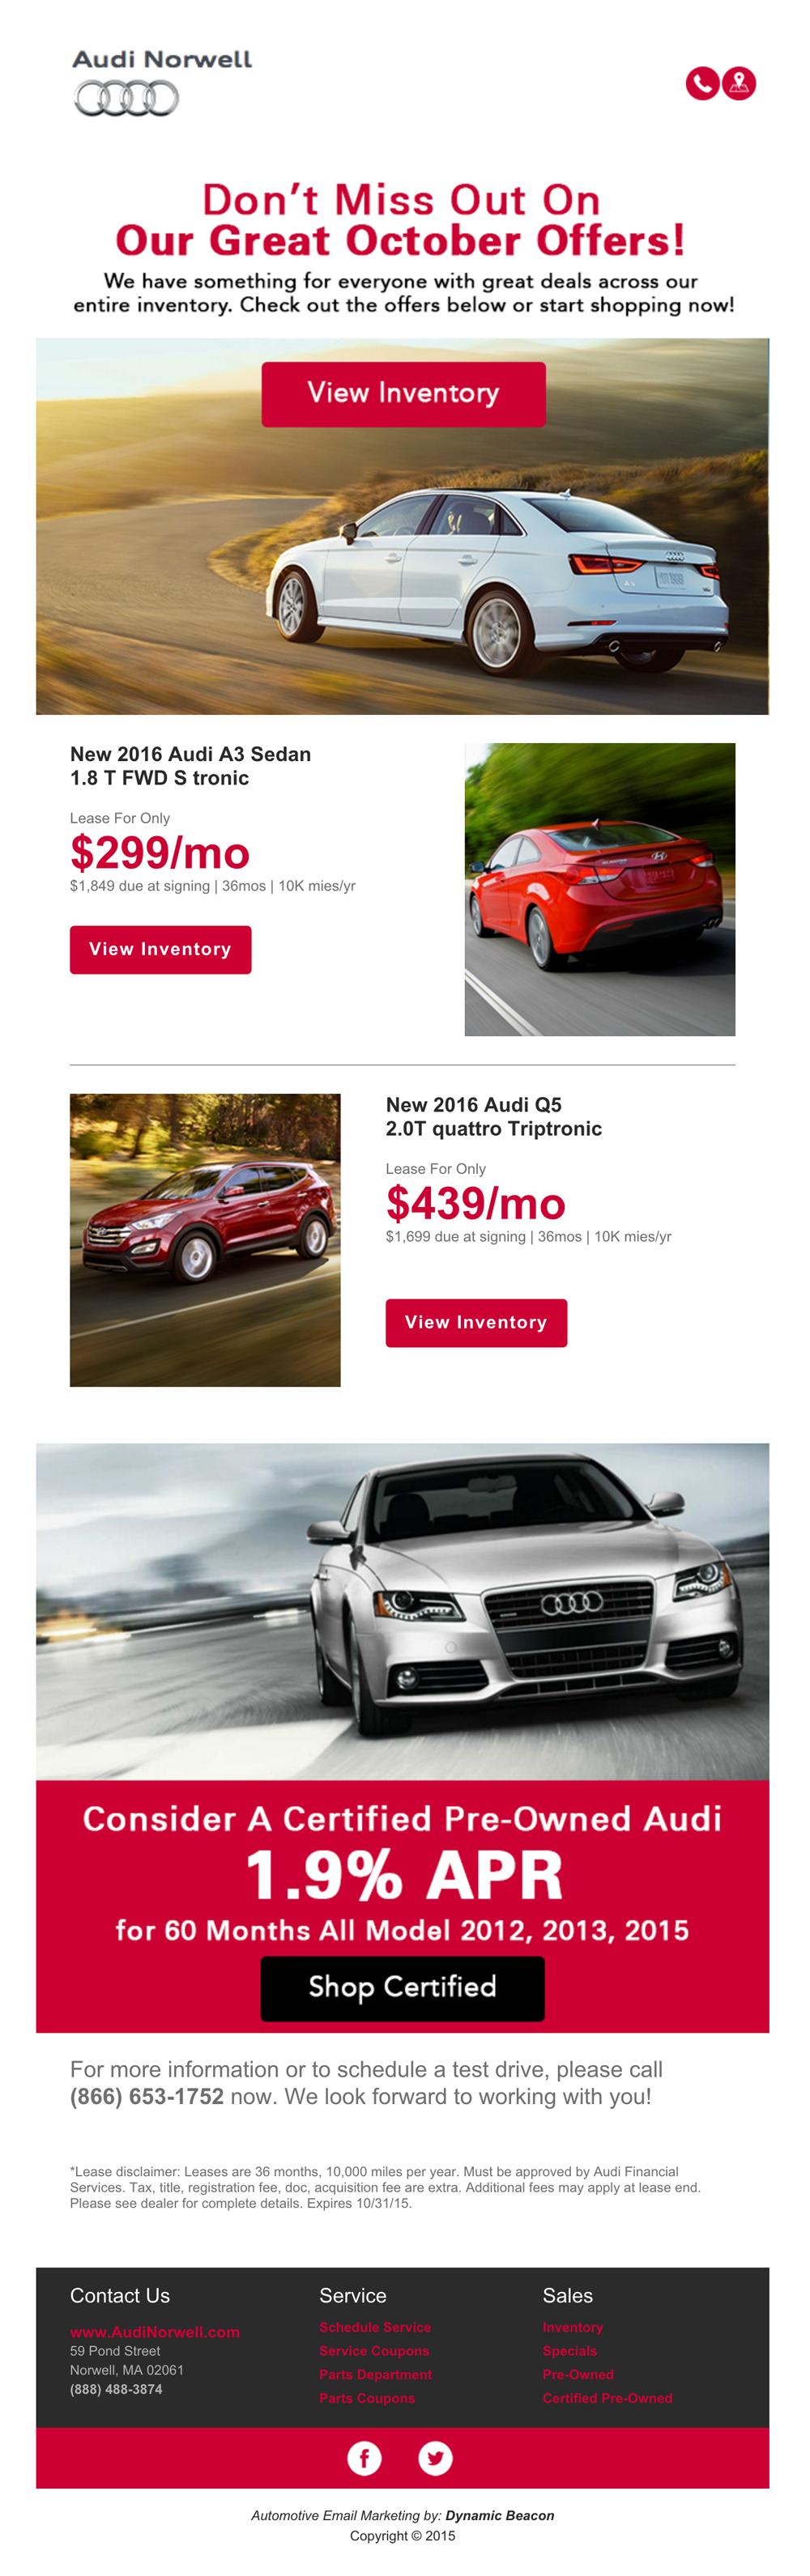 Audi Norwell Email Blast On Behance - Audi norwell